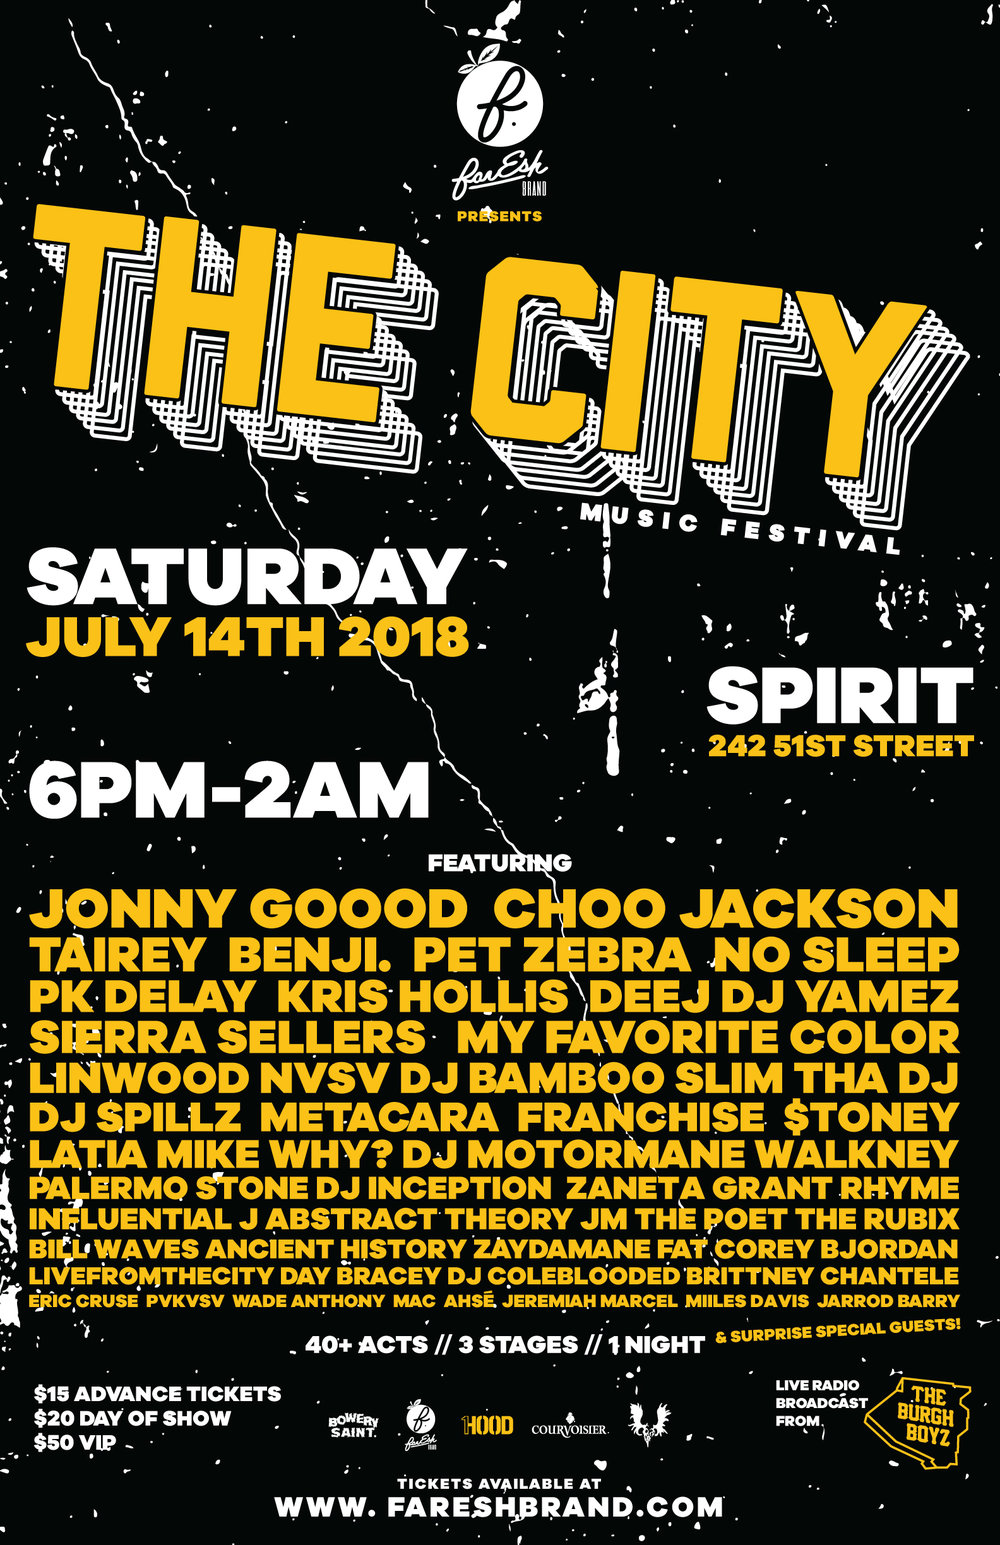 The-City-Flyer-July-2018.jpg